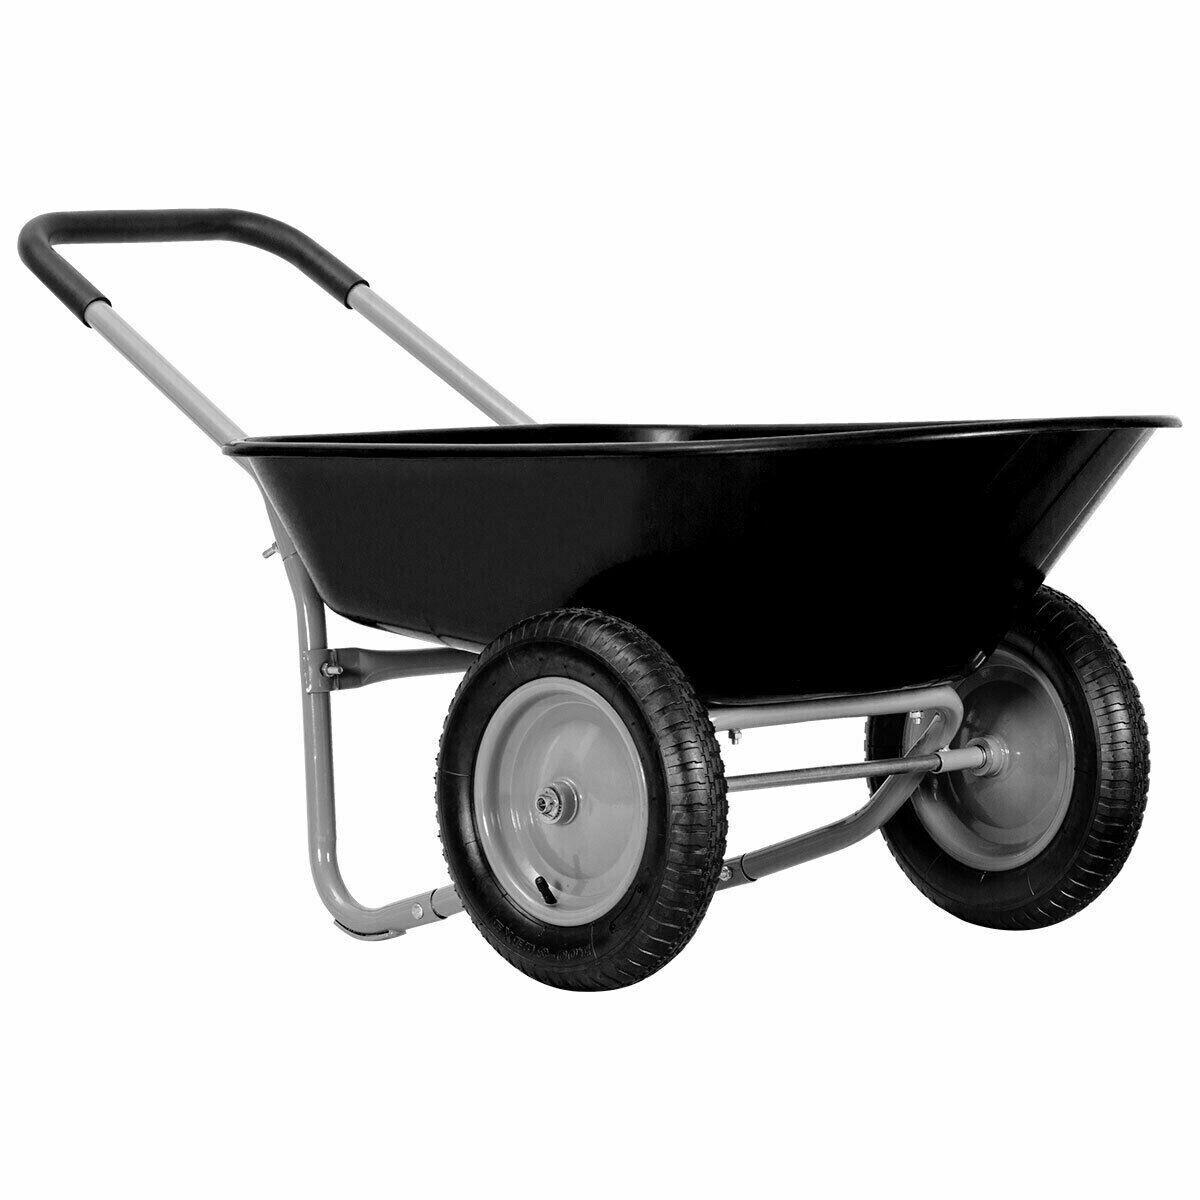 wheelbarrow 2 wheeled heavy duty garden cart